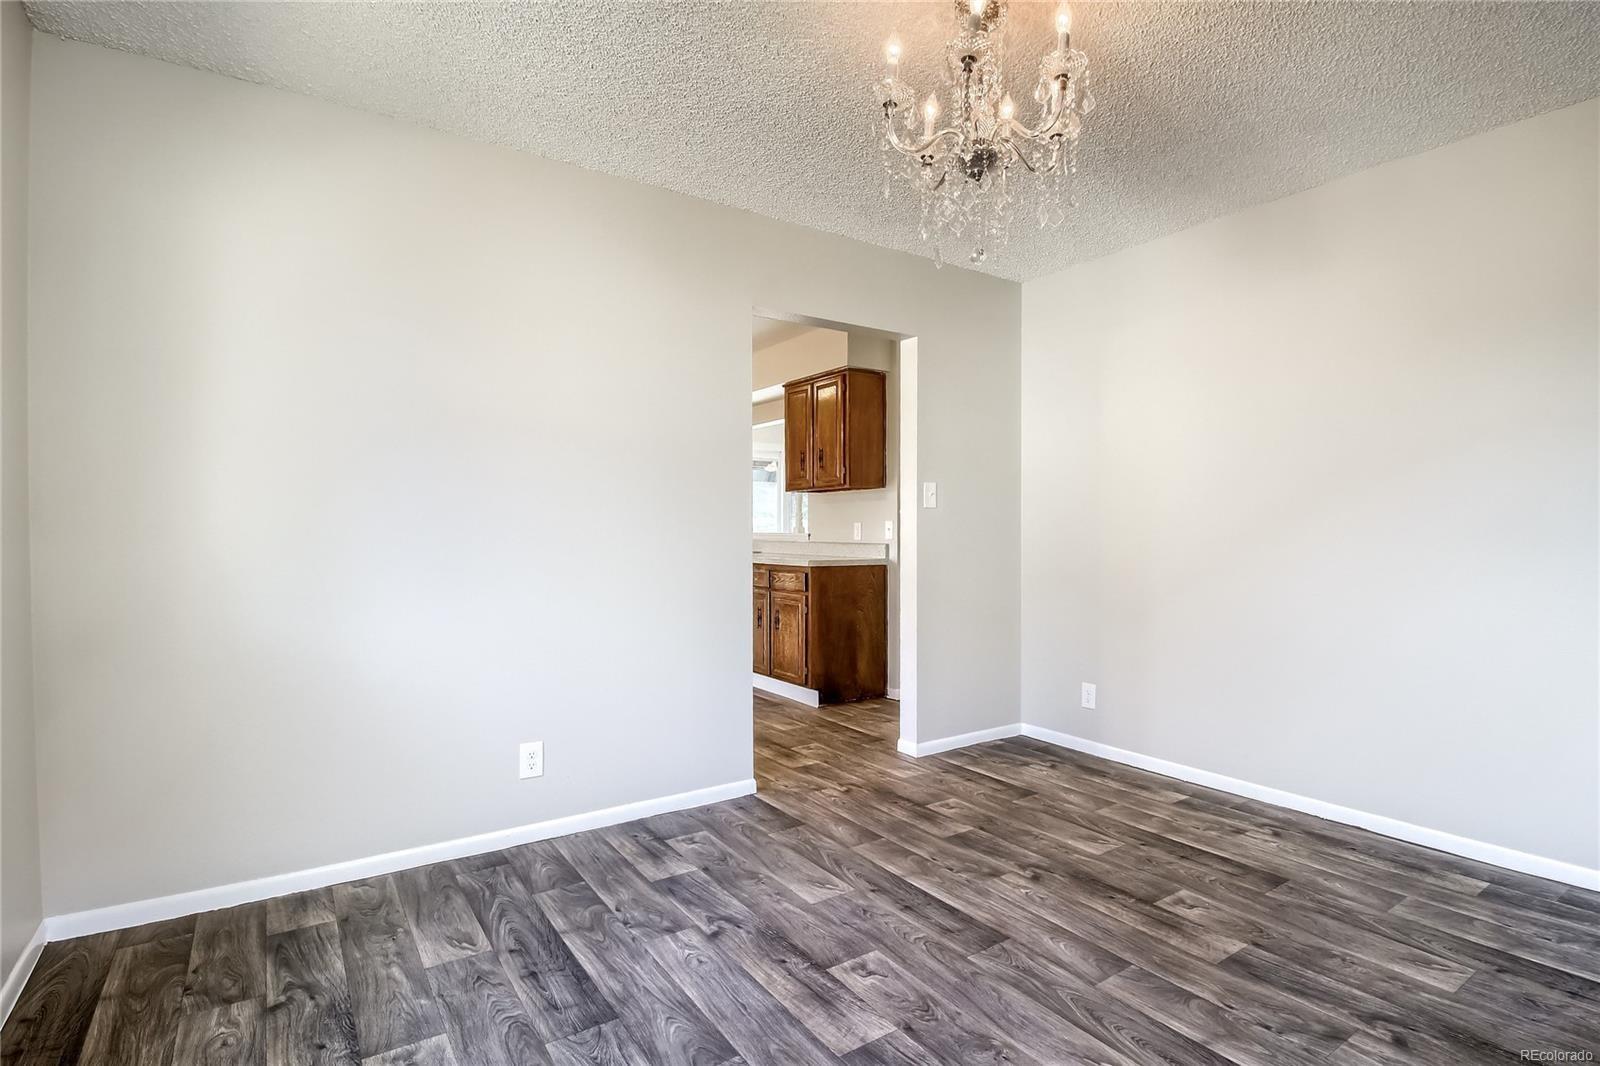 MLS# 4817896 - 16 - 5080 Worchester Street, Denver, CO 80239